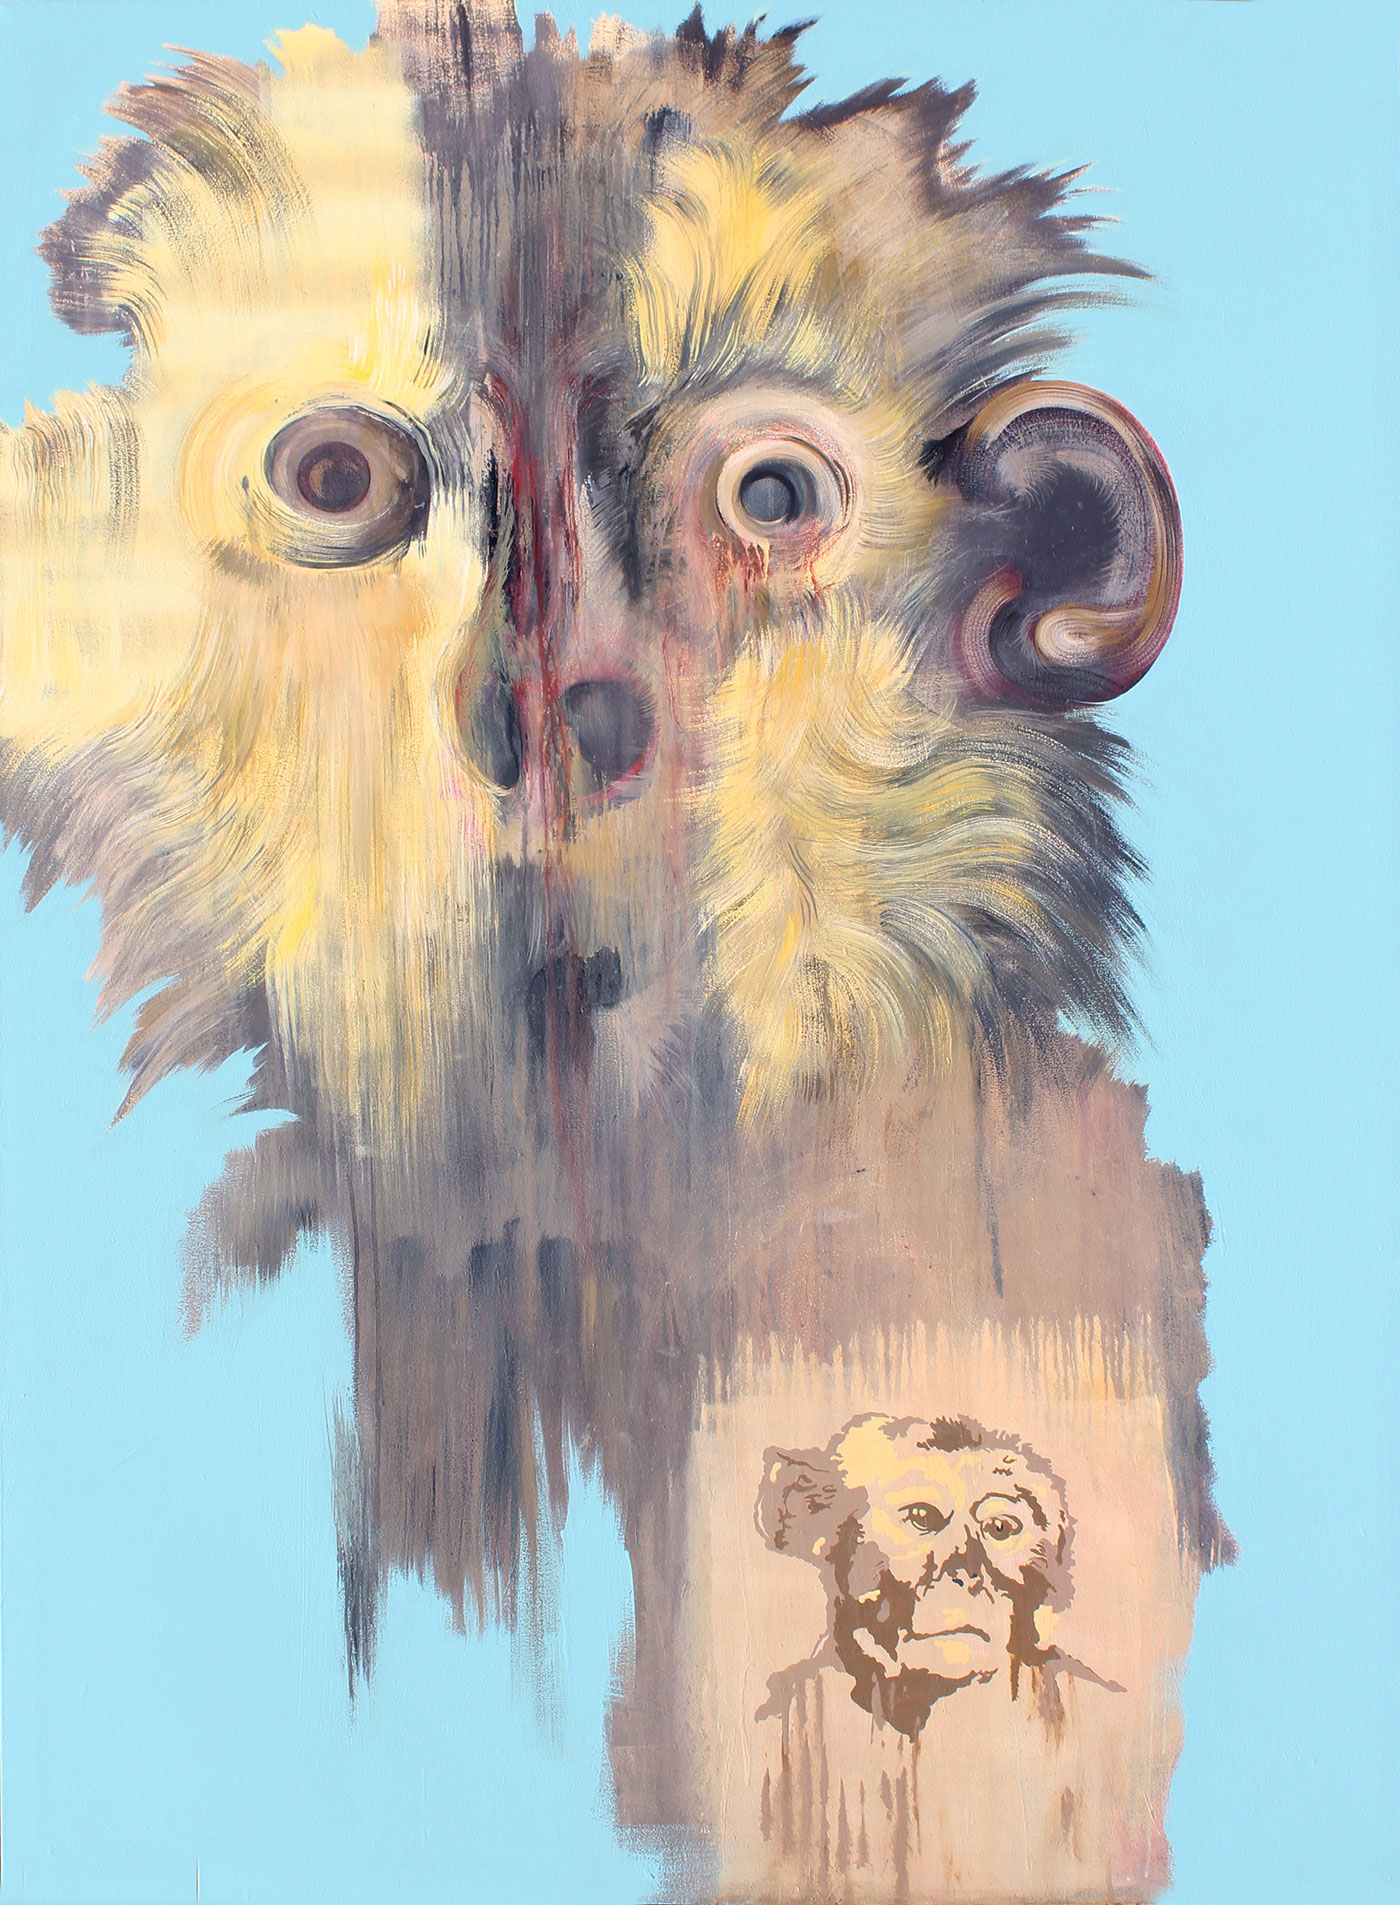 Painting of frightened monkey